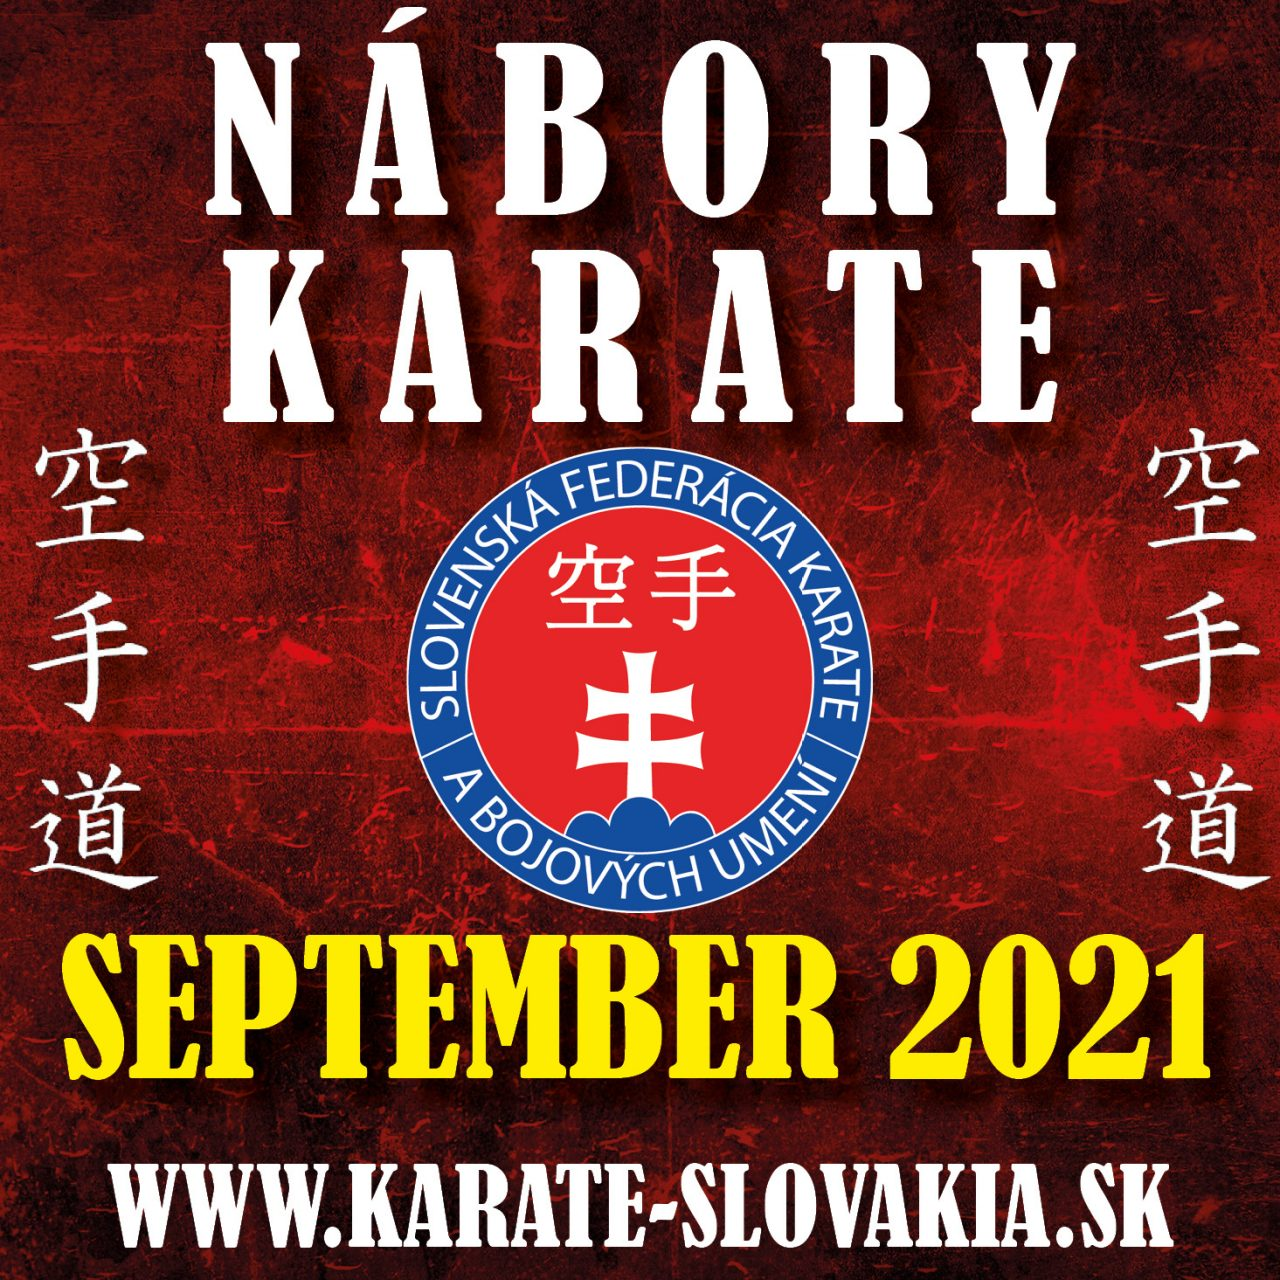 https://karate-slovakia.sk/wp-content/uploads/nabory-SFK-1280x1280.jpg